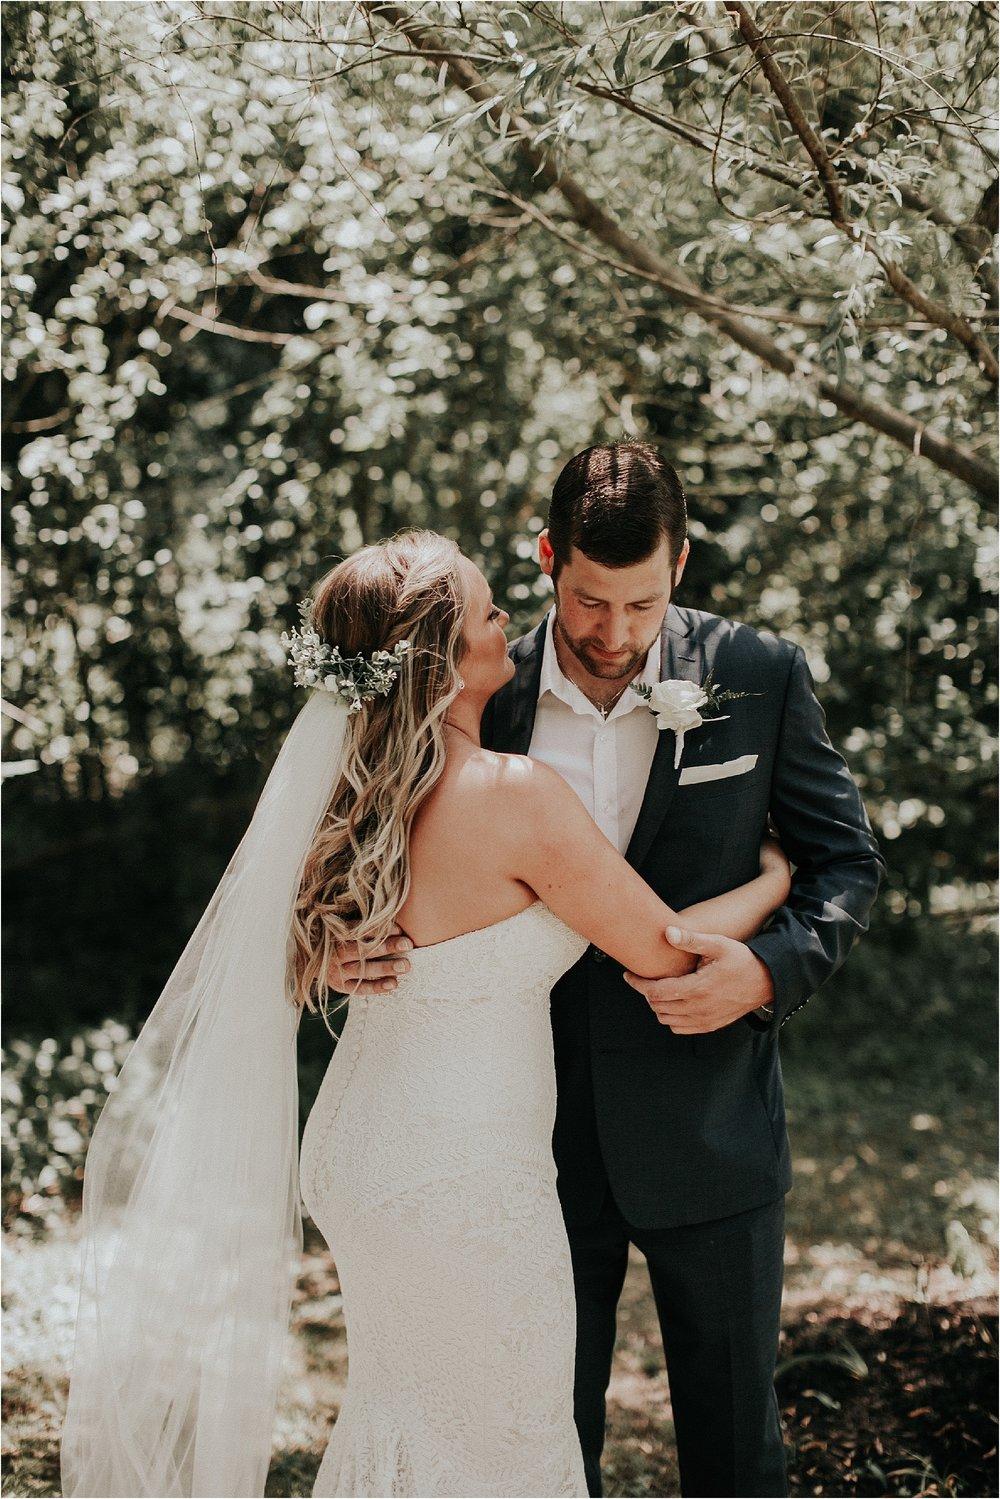 Valenzano_Winery_NJ_Wedding_Photographer_0009.jpg